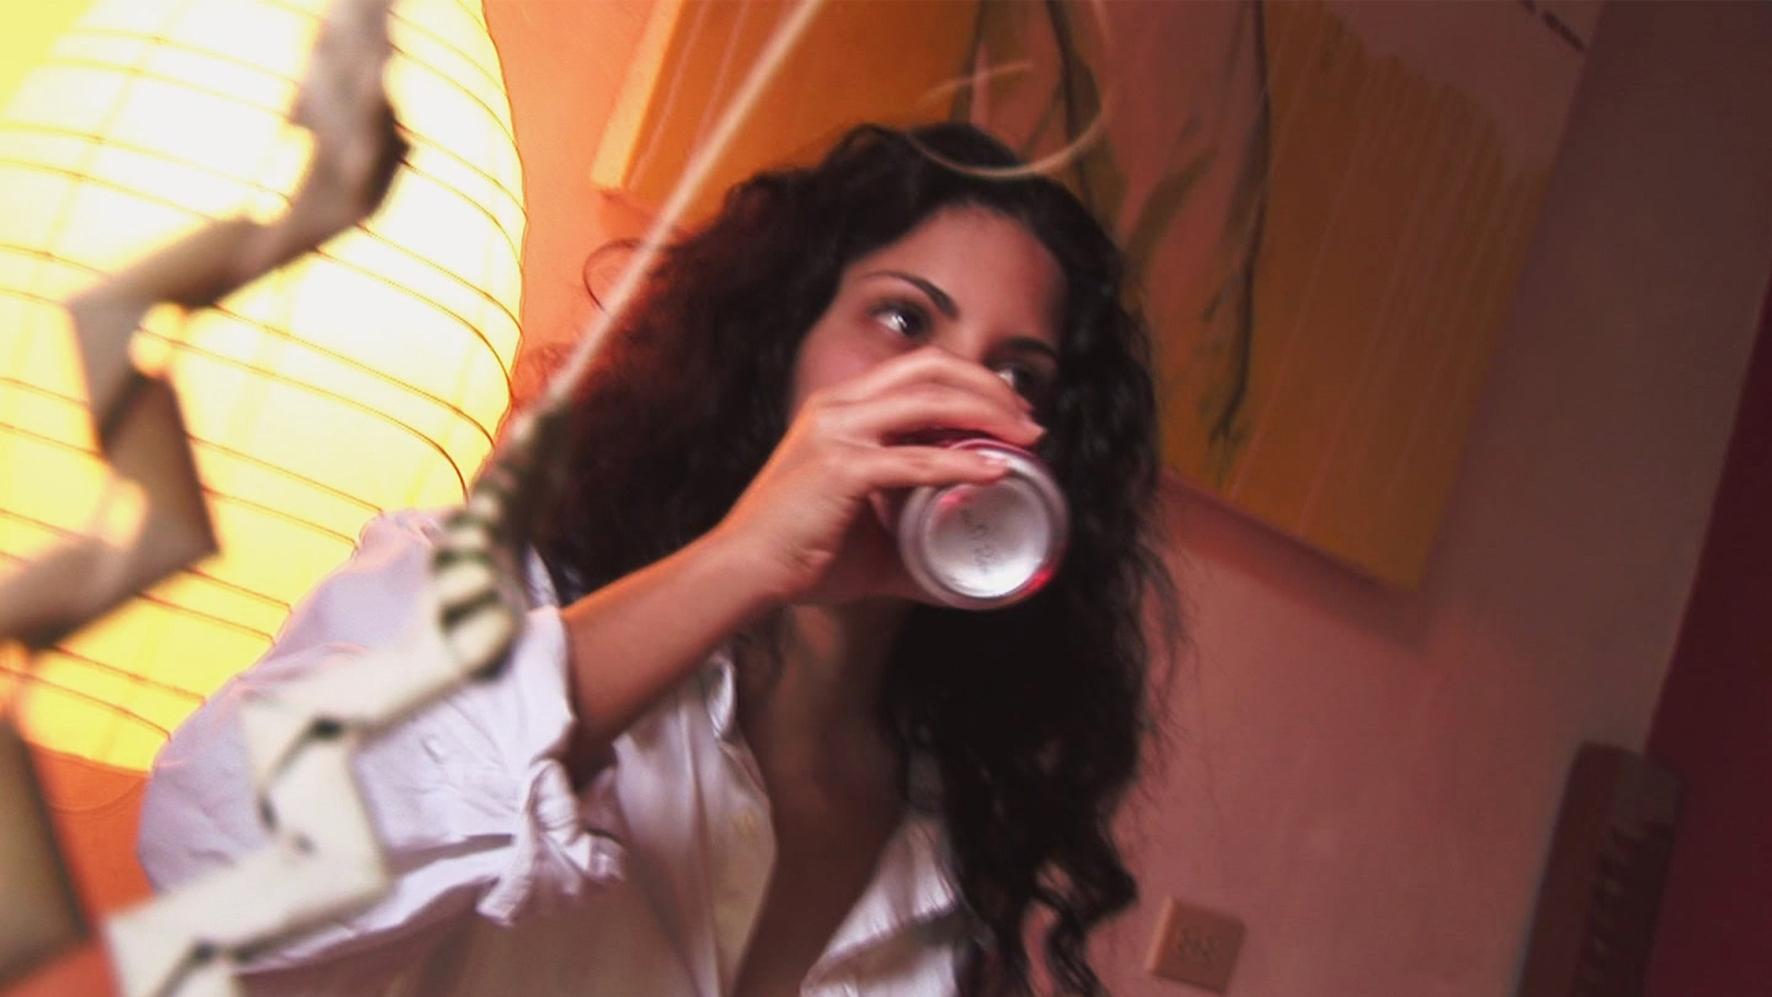 7.-Merienda-2009-Video-Performance-Naivy-Perez